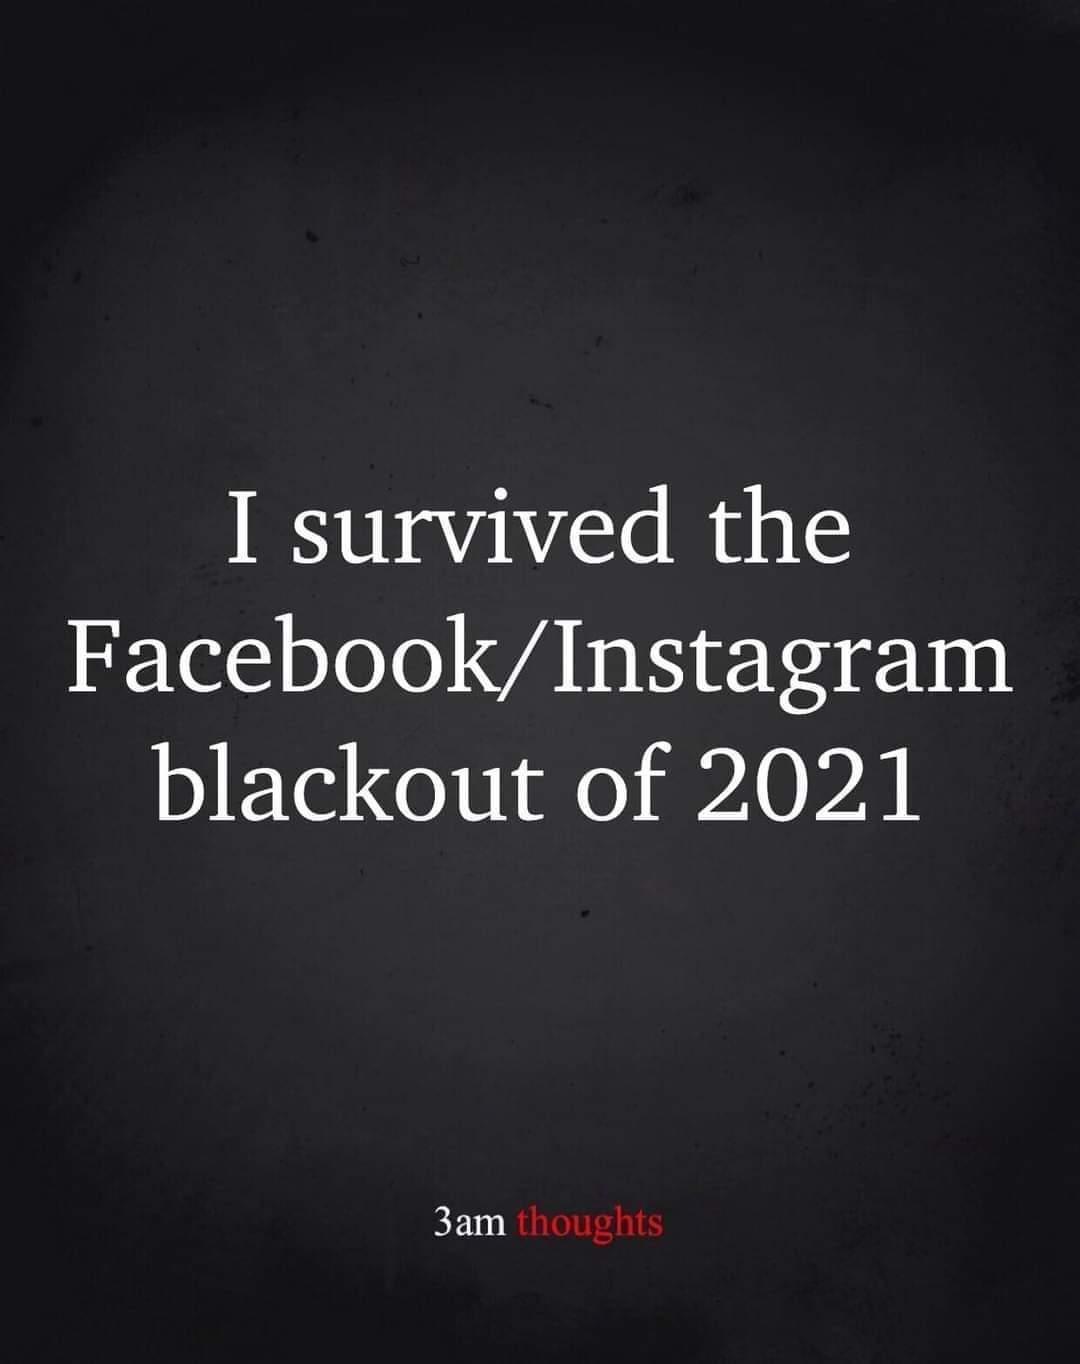 facebook blackout